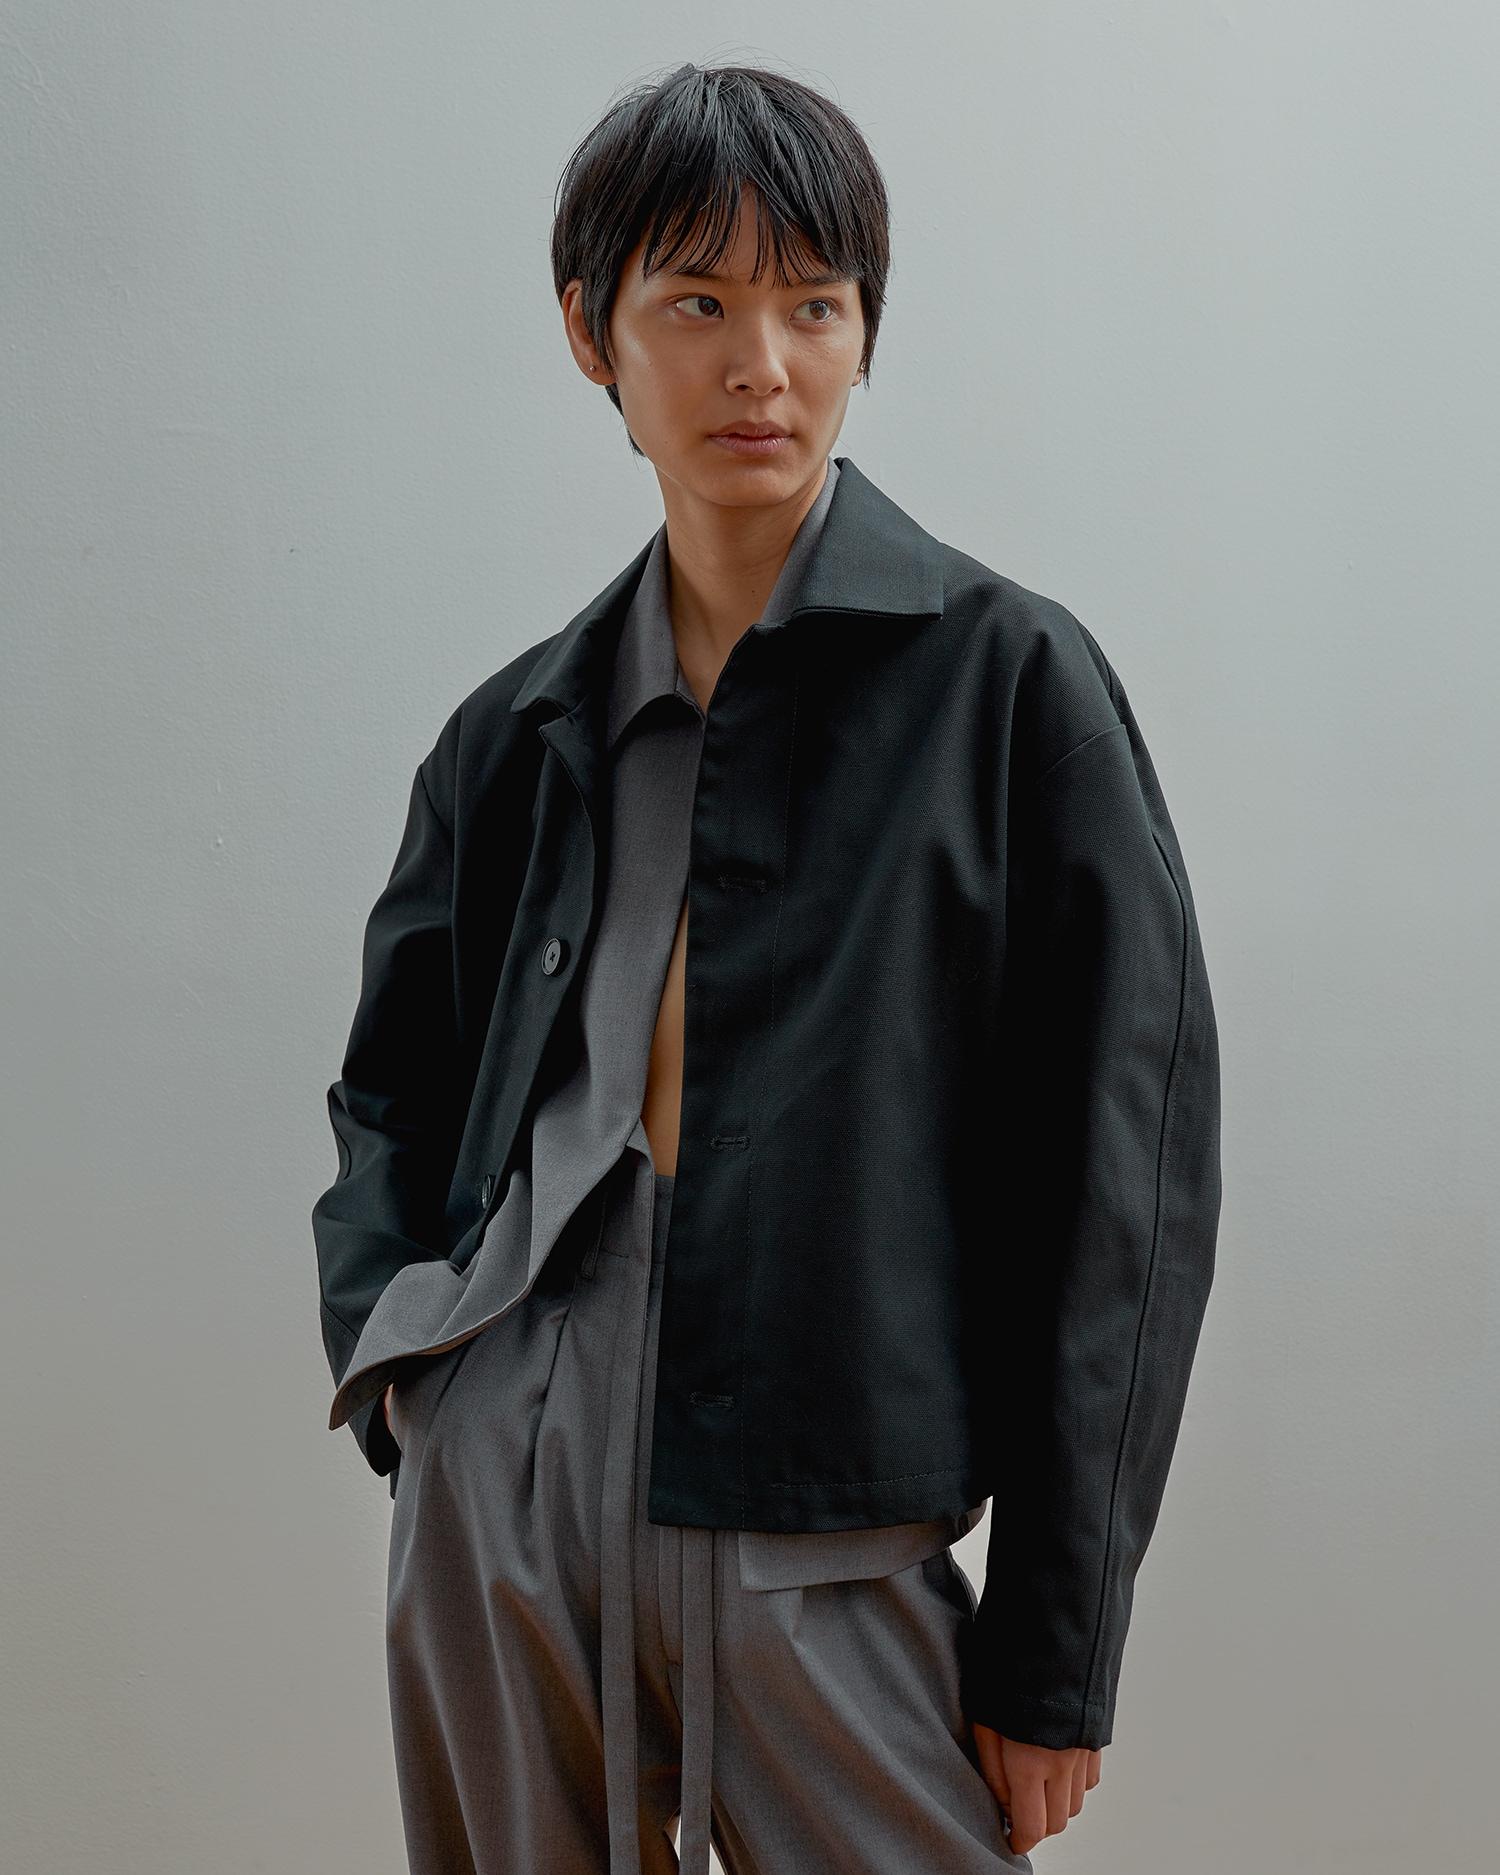 Shop Unisex Jacket By One DNA. Sustainable Fashion.